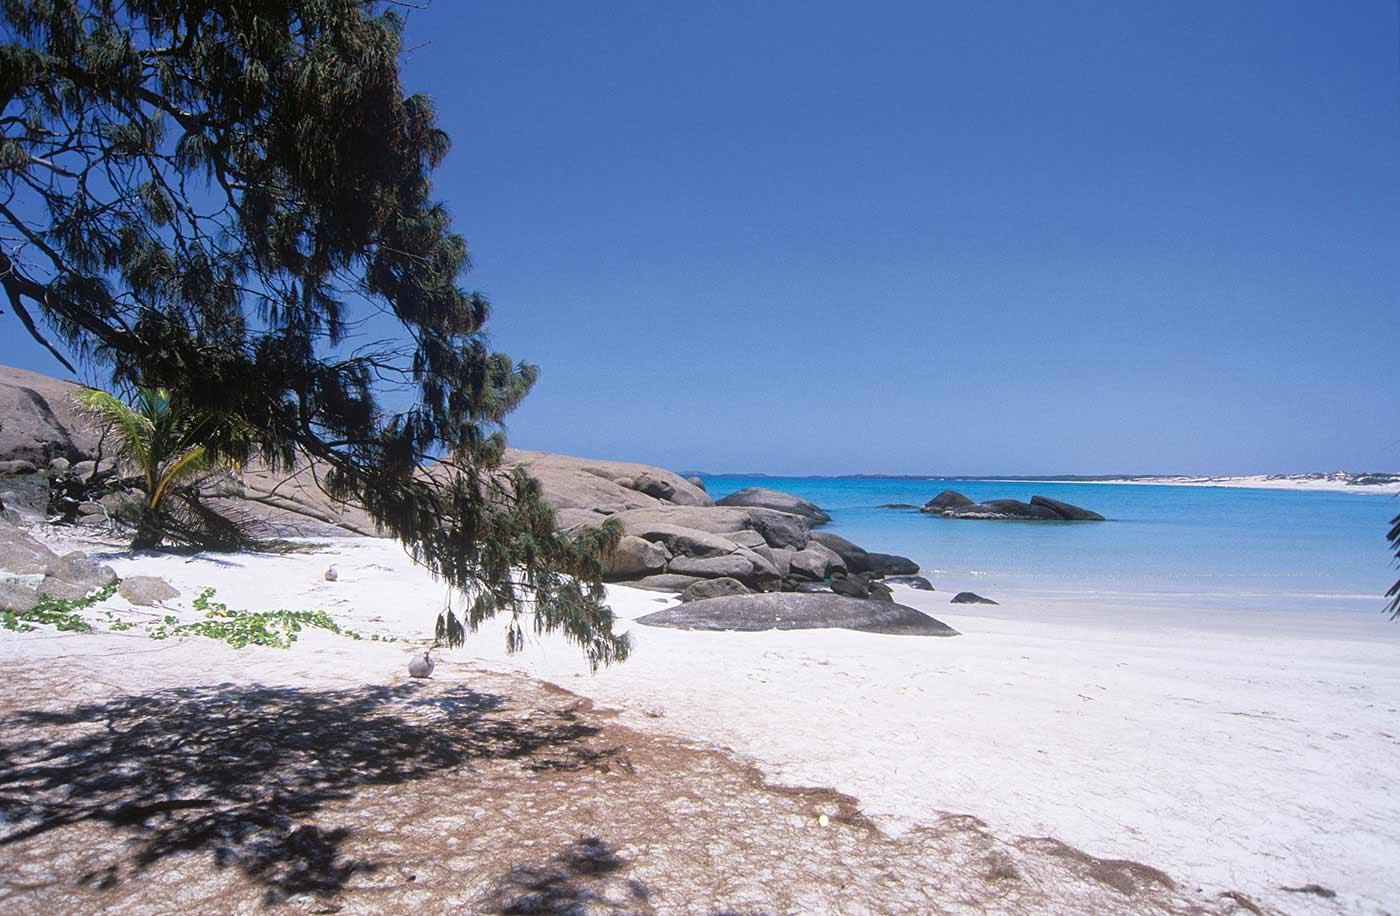 Yalangbara beach - click to view larger image